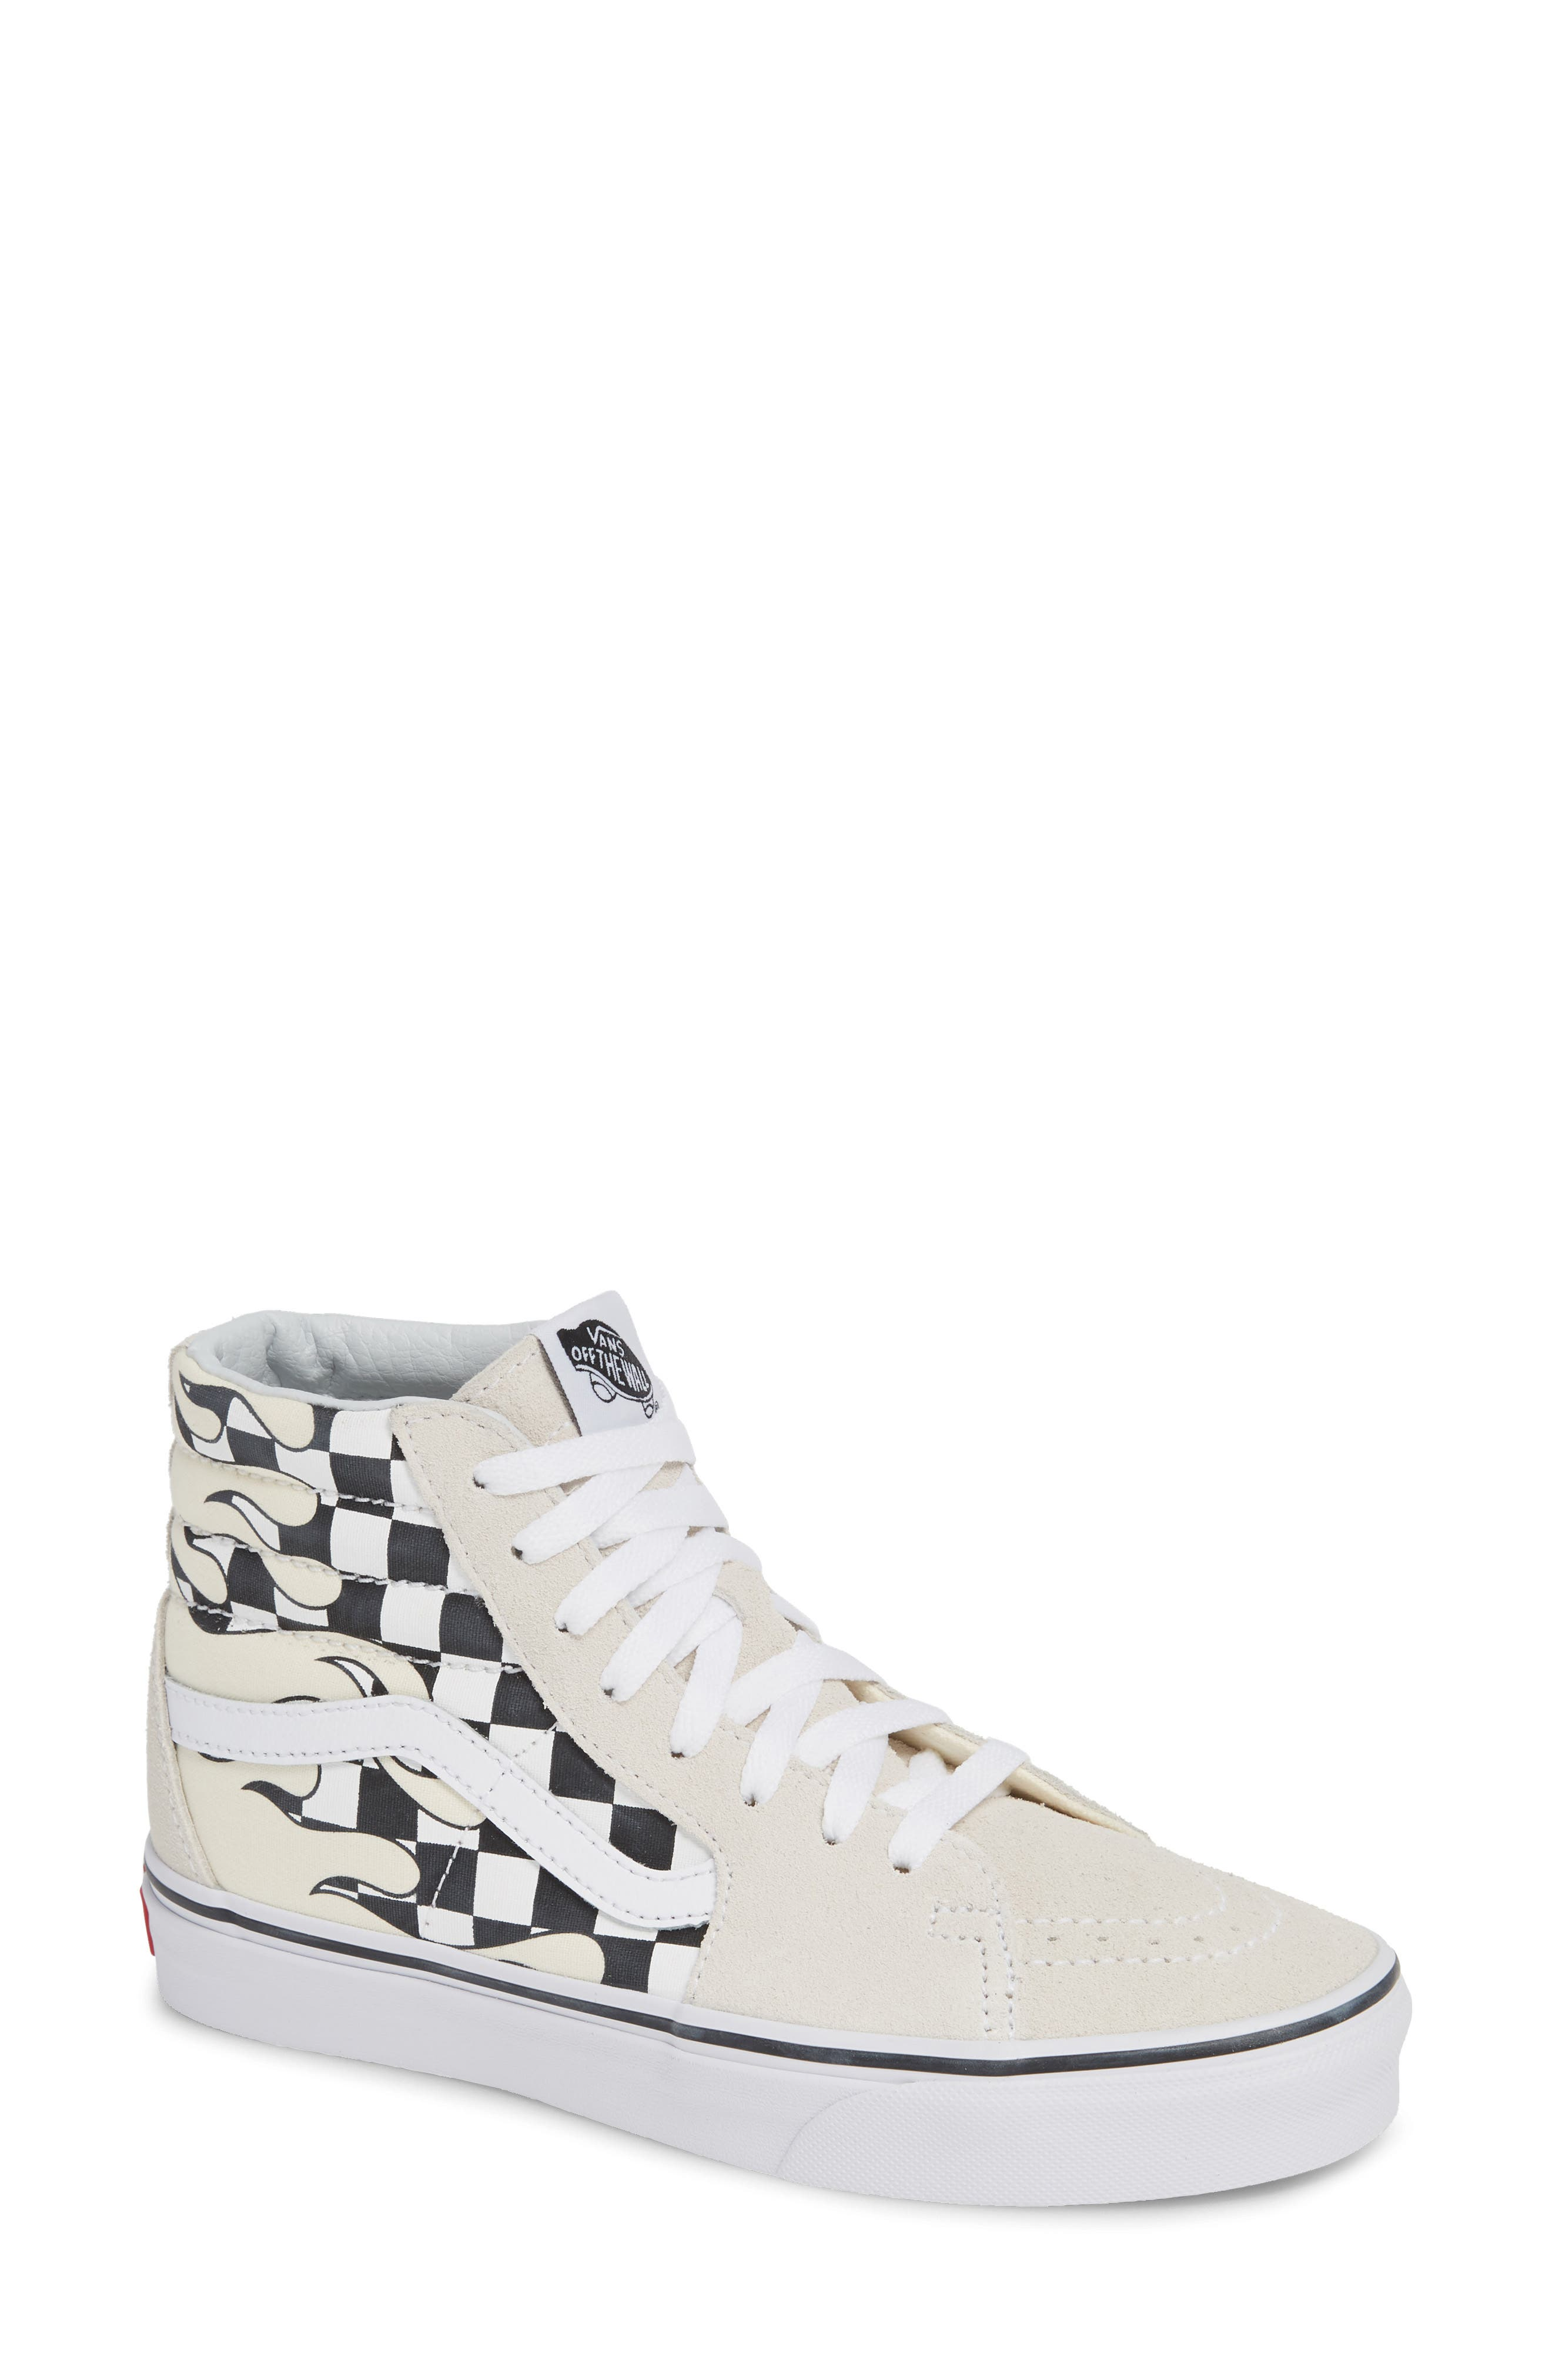 Sk8-Hi Checker Sneaker,                             Main thumbnail 1, color,                             CLASSIC WHITE/ TRUE WHITE